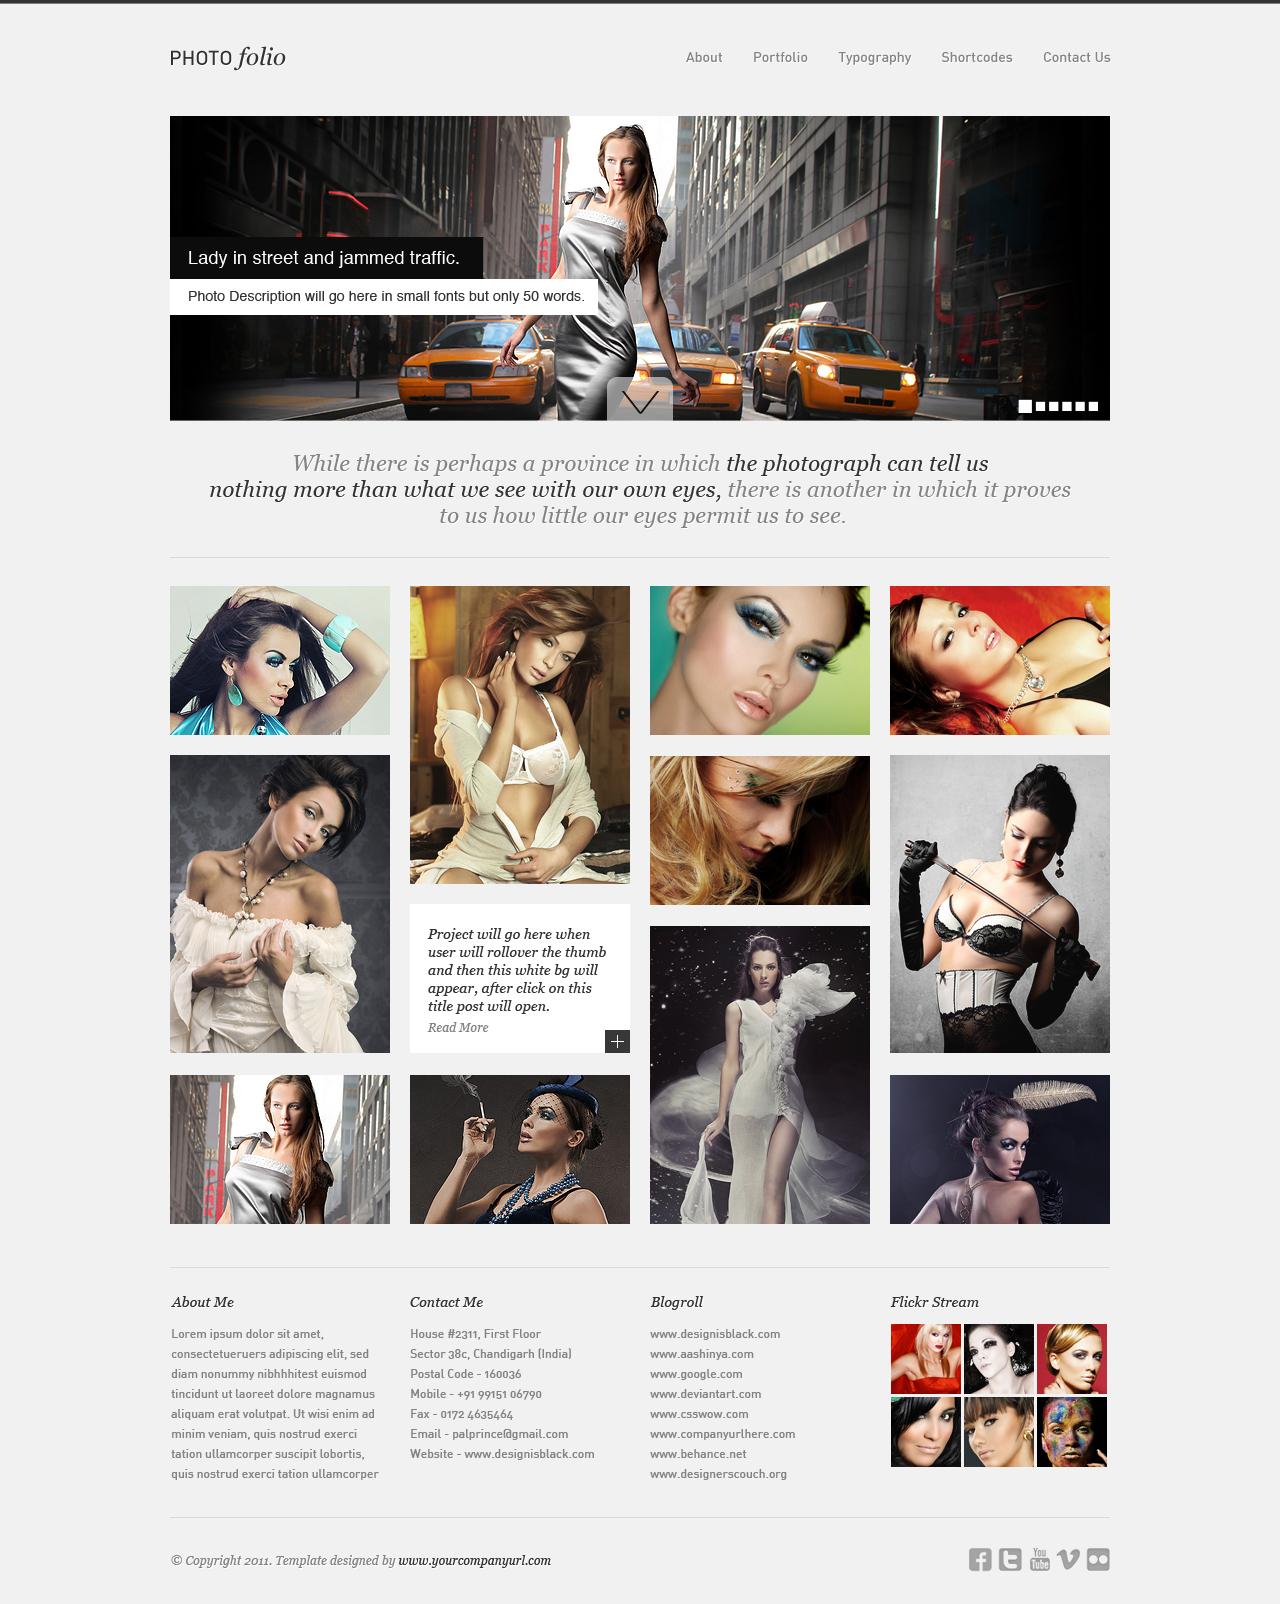 Minimal PhotoFolio WP Theme by princepal